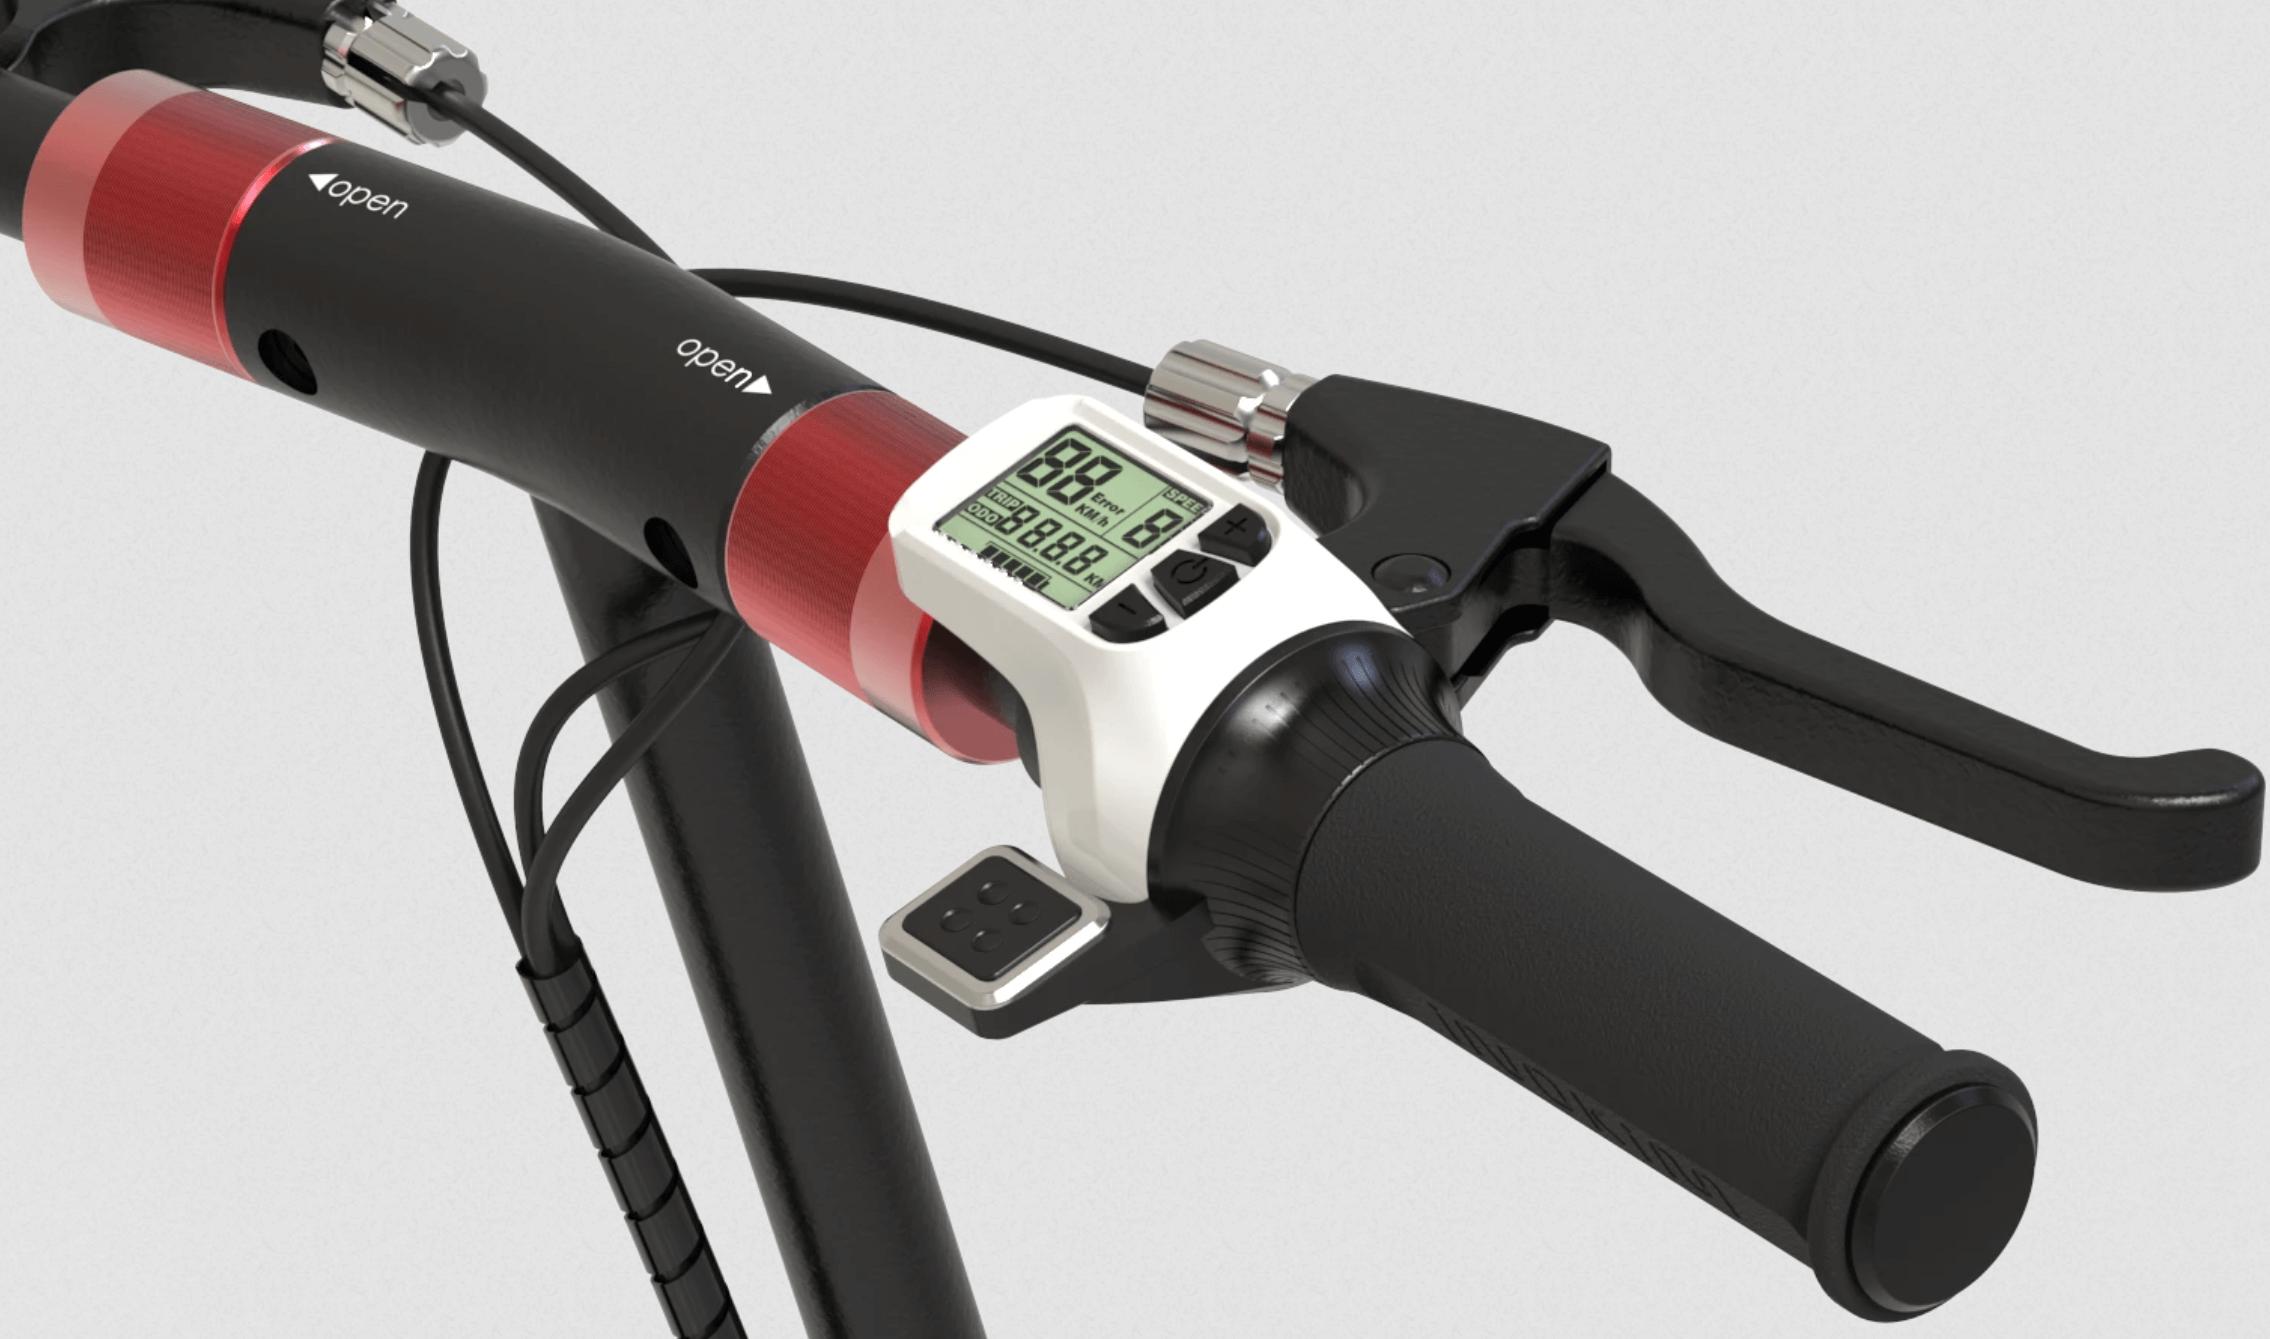 Inokim scooter with longer handlebars and digital LCD screen monitor